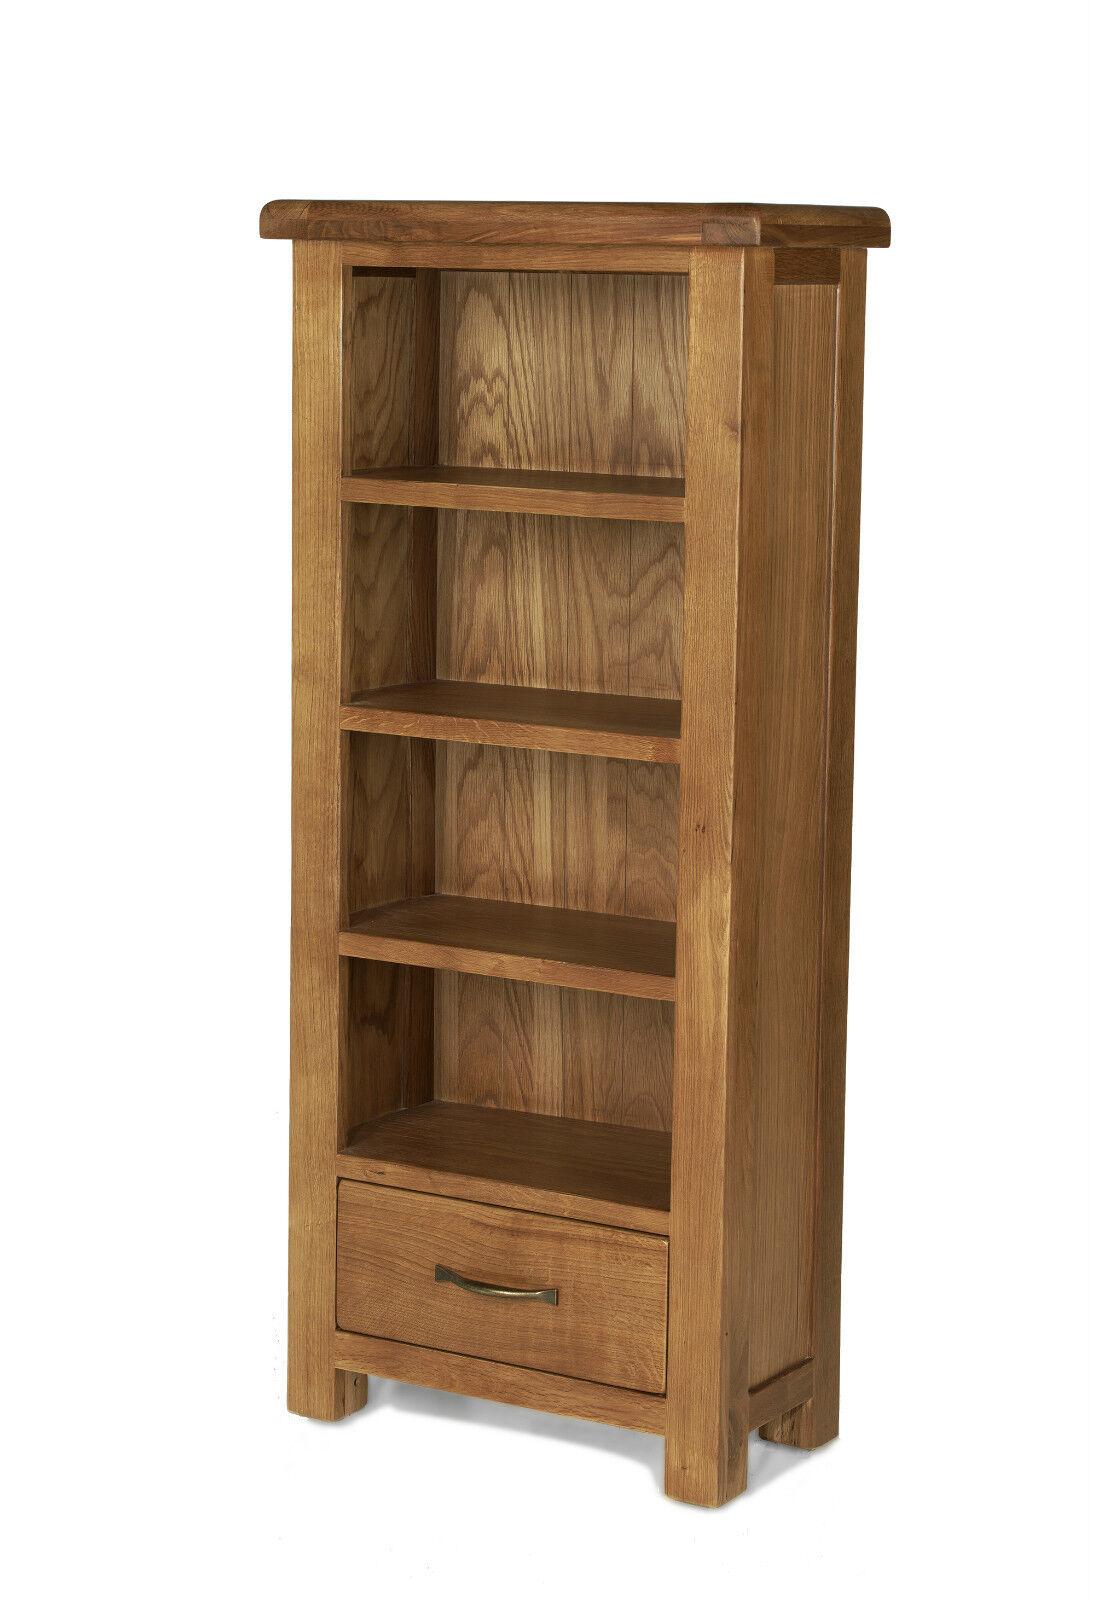 Earlsbury Solid Chunky Wood Rustic Oak Narrow Open Bookcase Cd Dvd